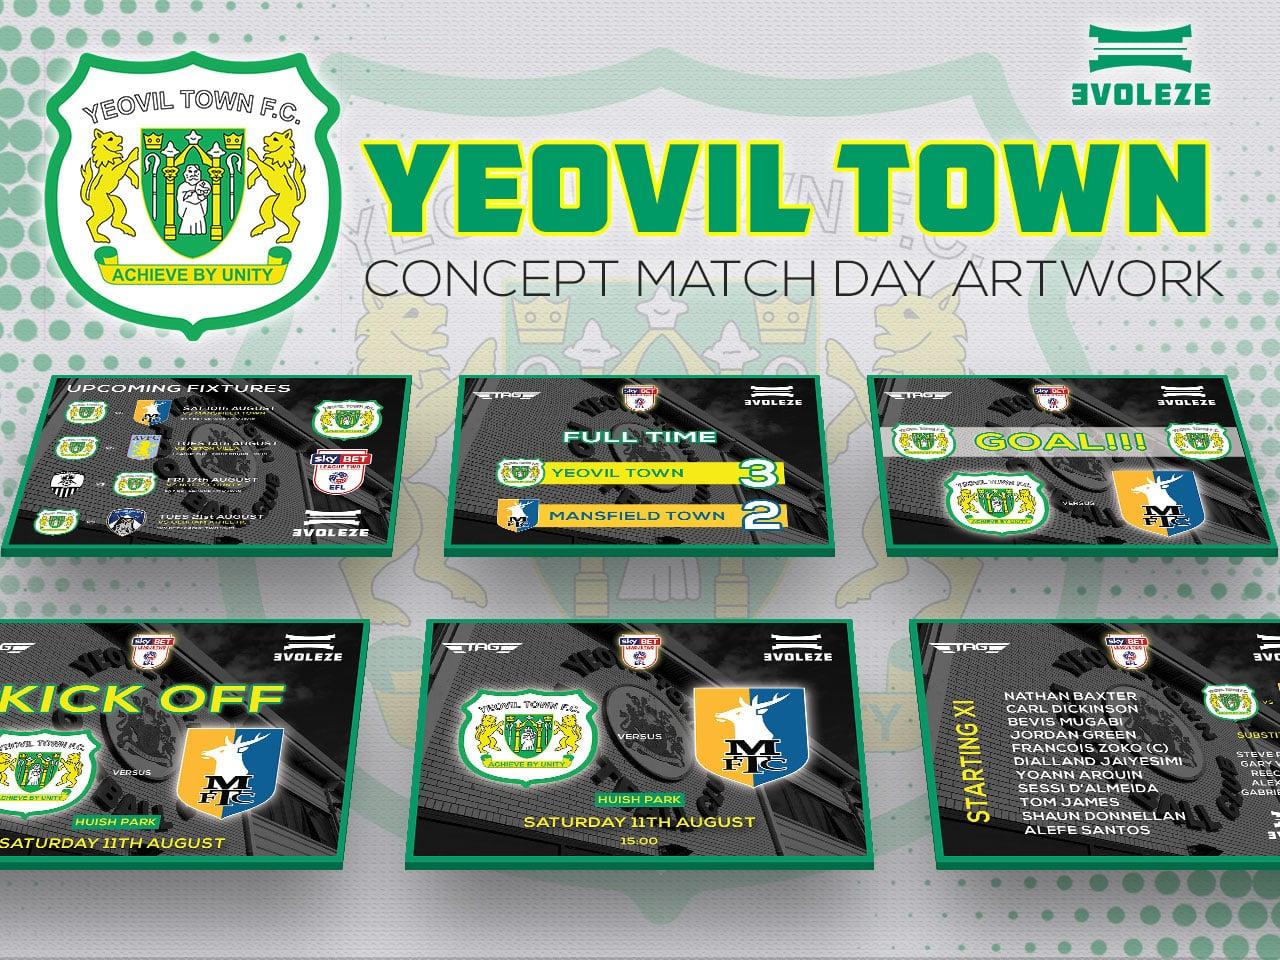 Yeovil Town FC match day artwork set